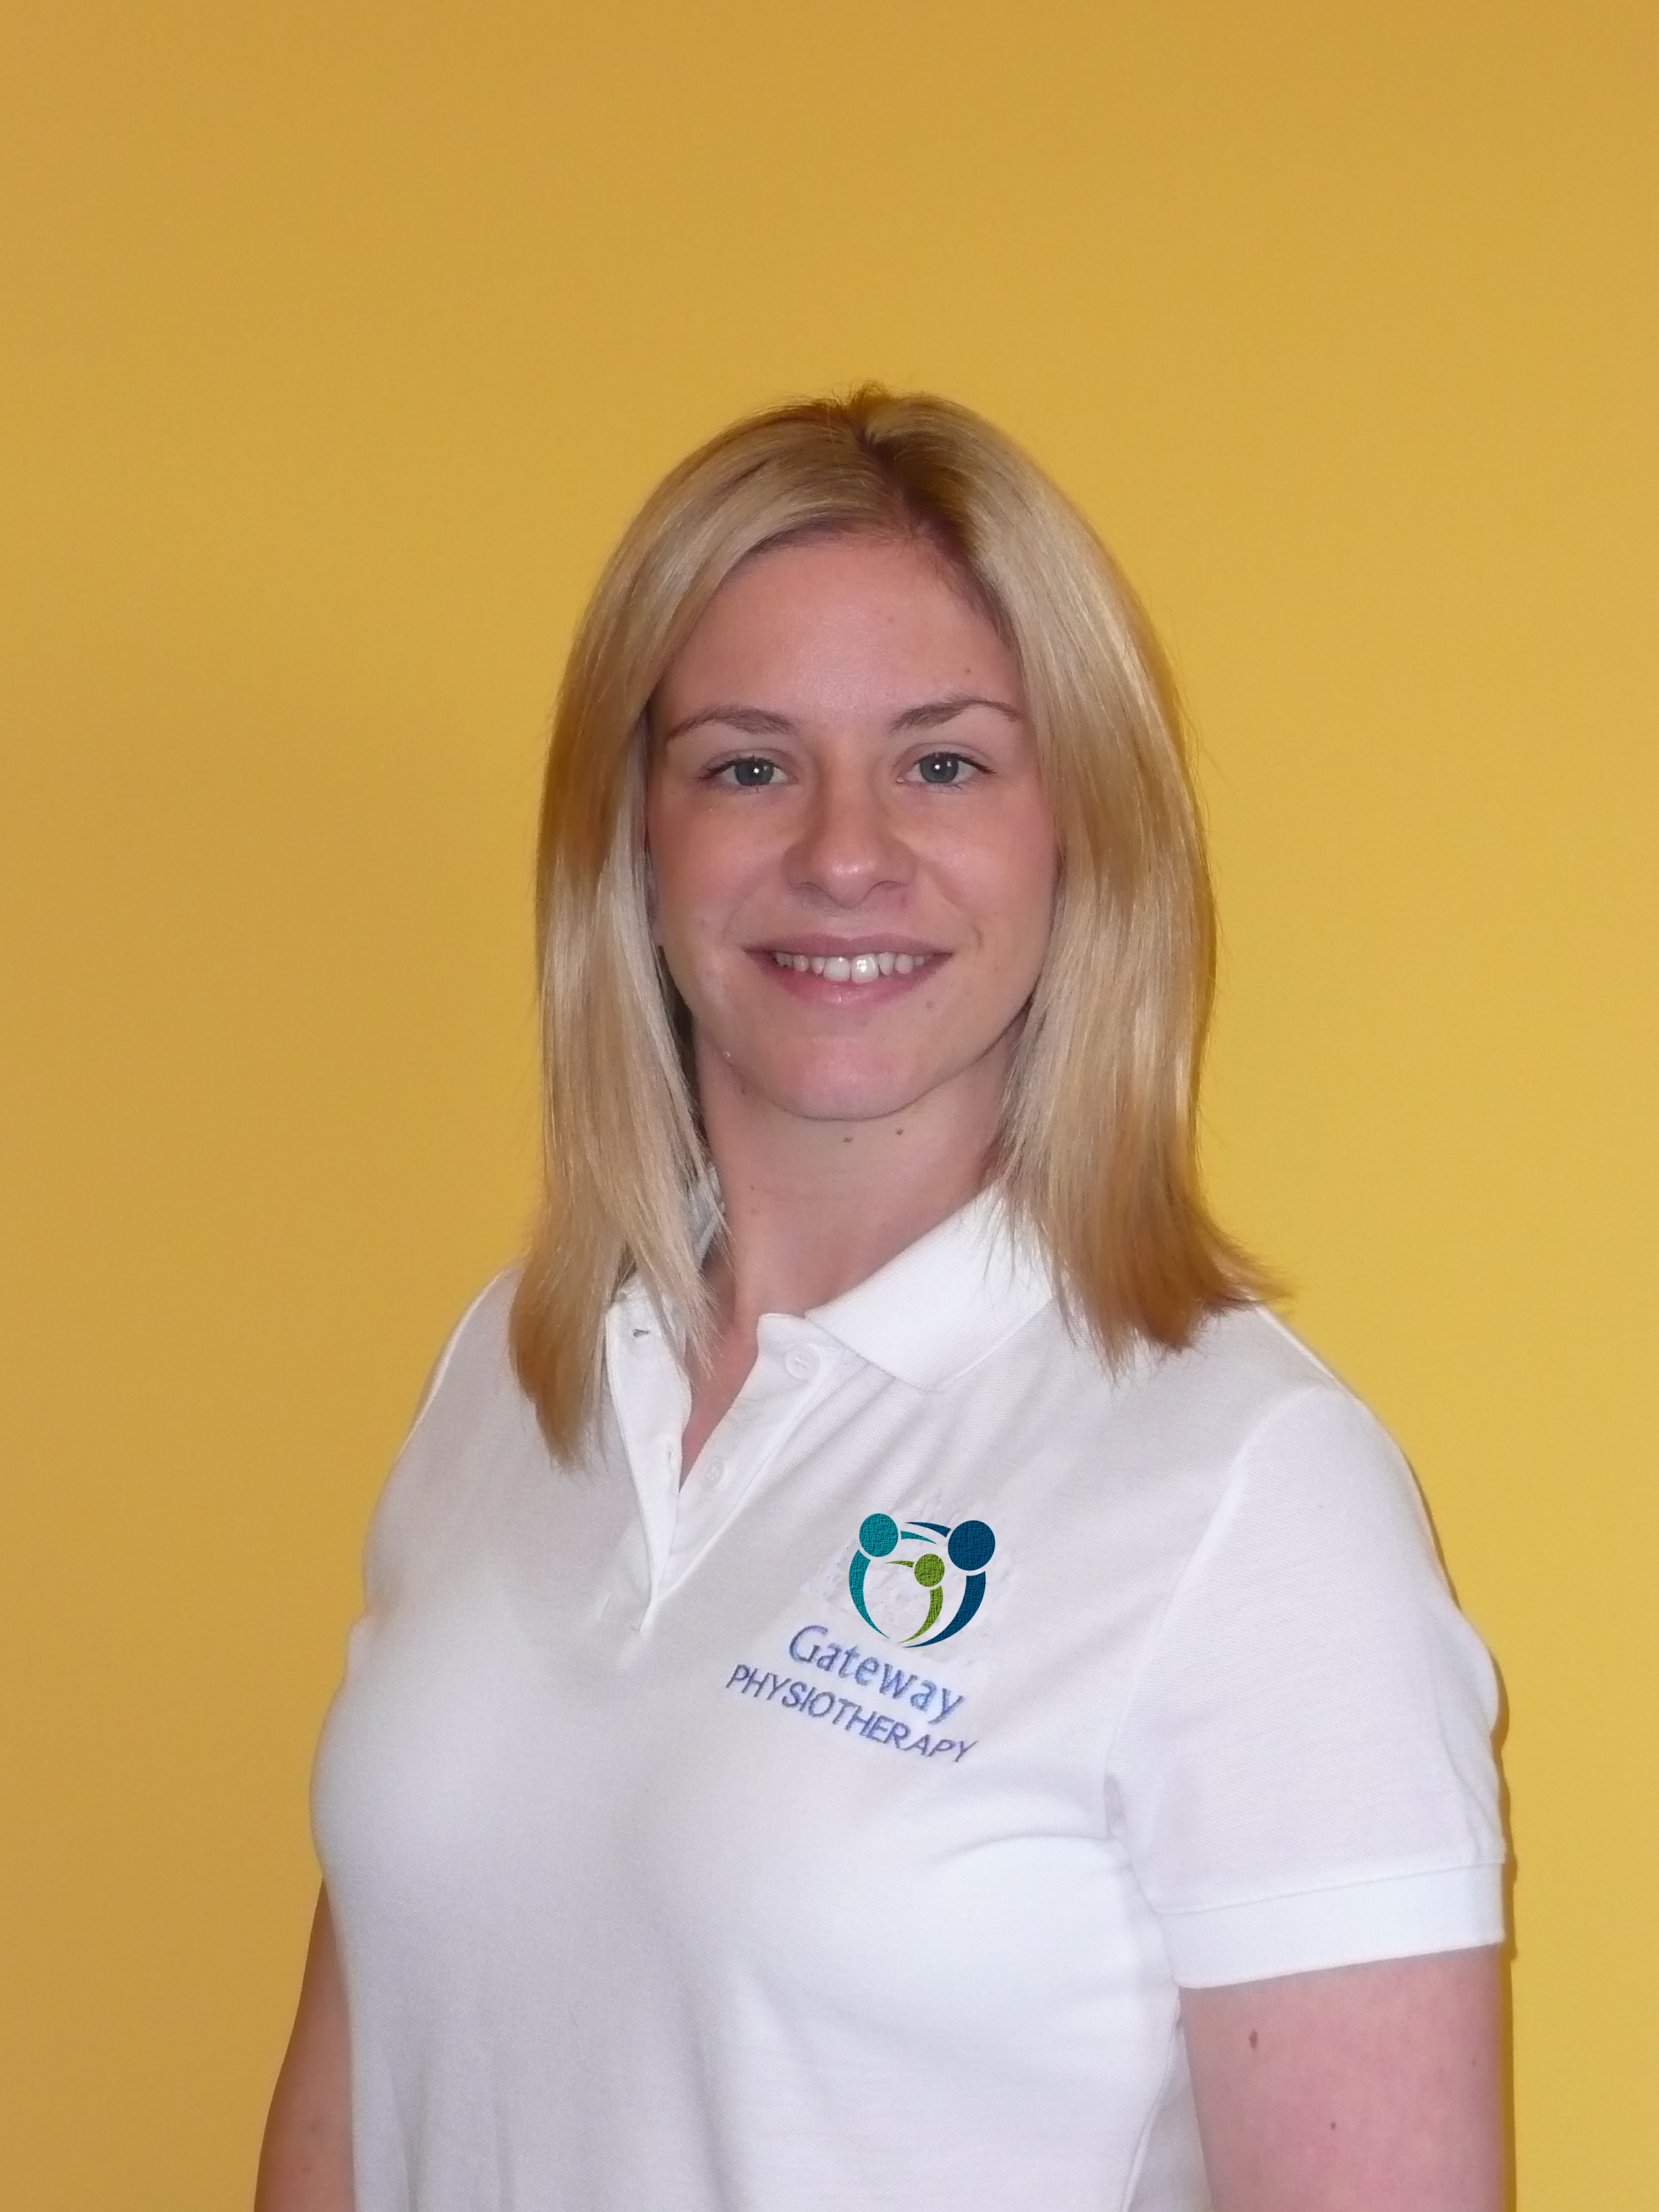 Laura Dent - Paediatric Physiotherapist